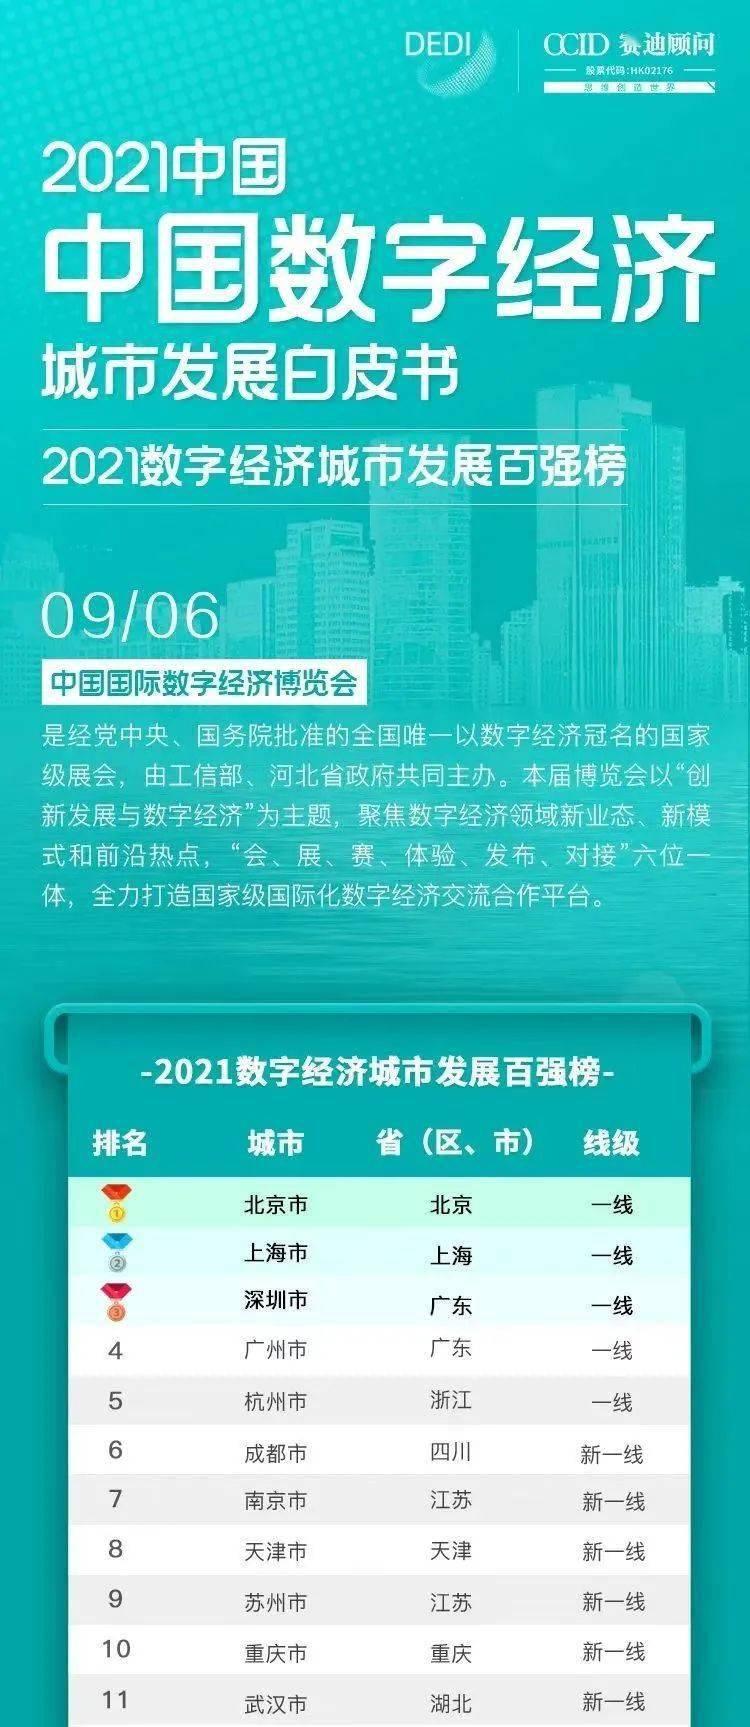 2021gdp城市_湖广两省2021年上半年各市GDP对比分析,其实差异不大